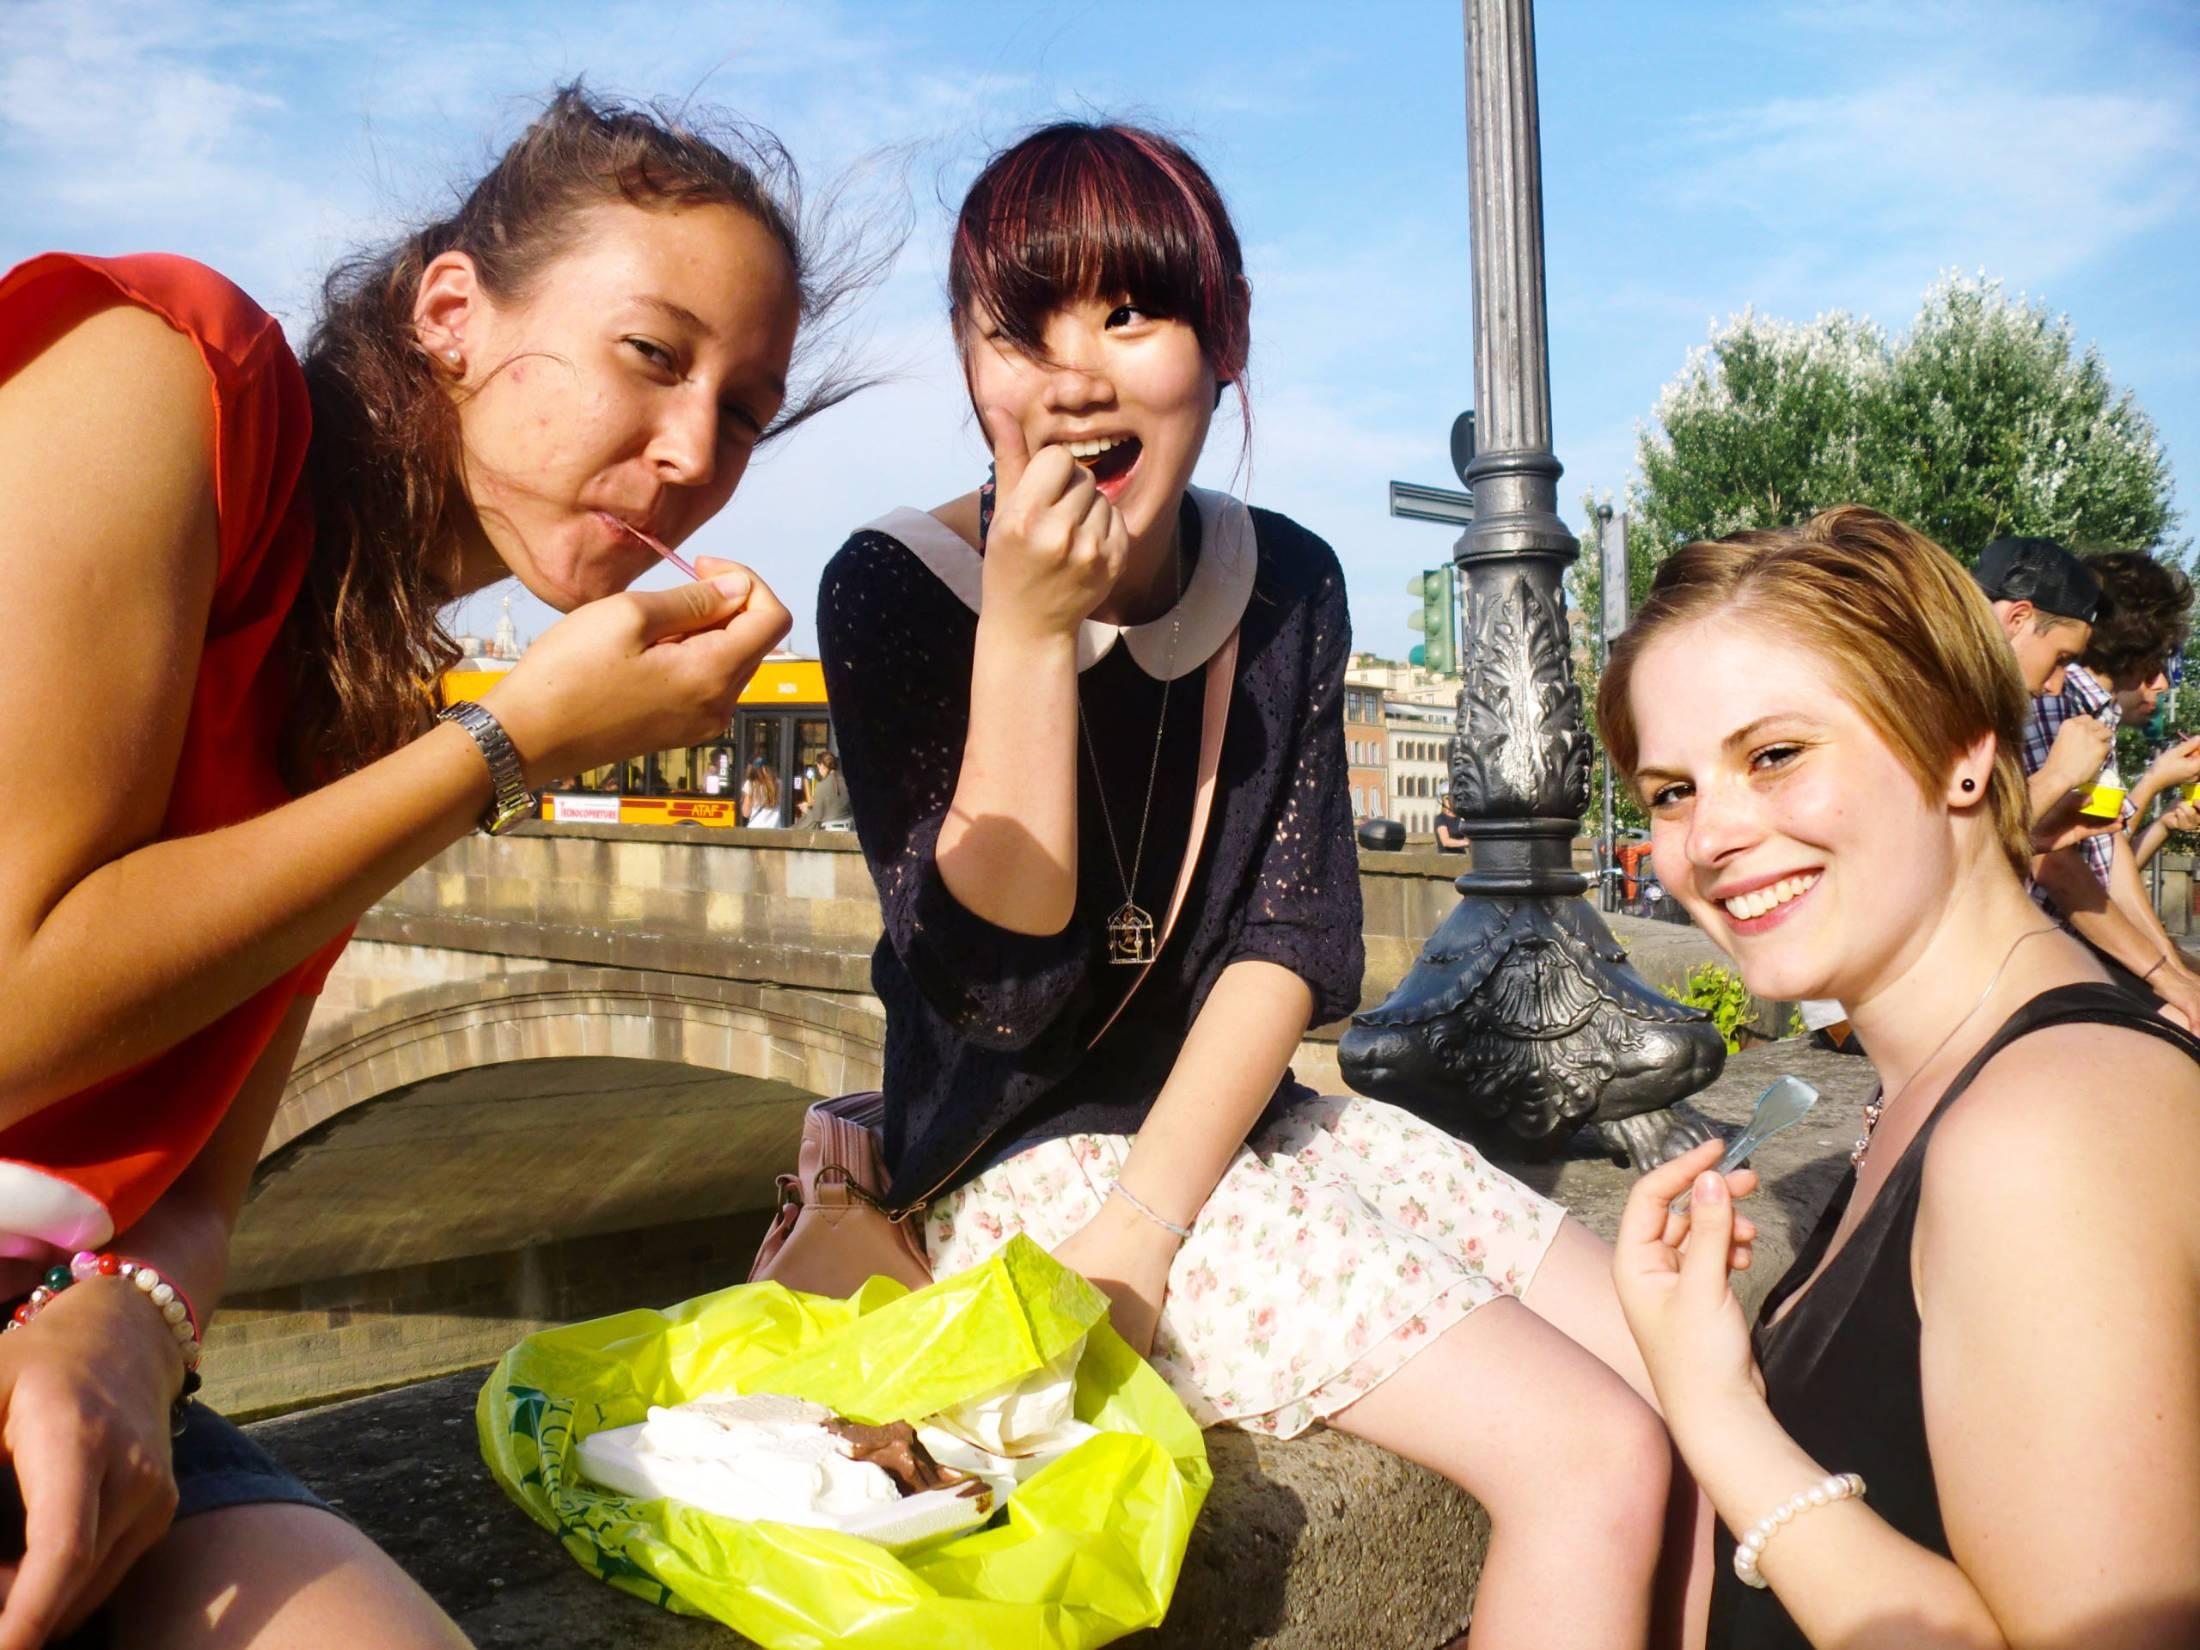 Teenagers arounf Florence learning italian and eating